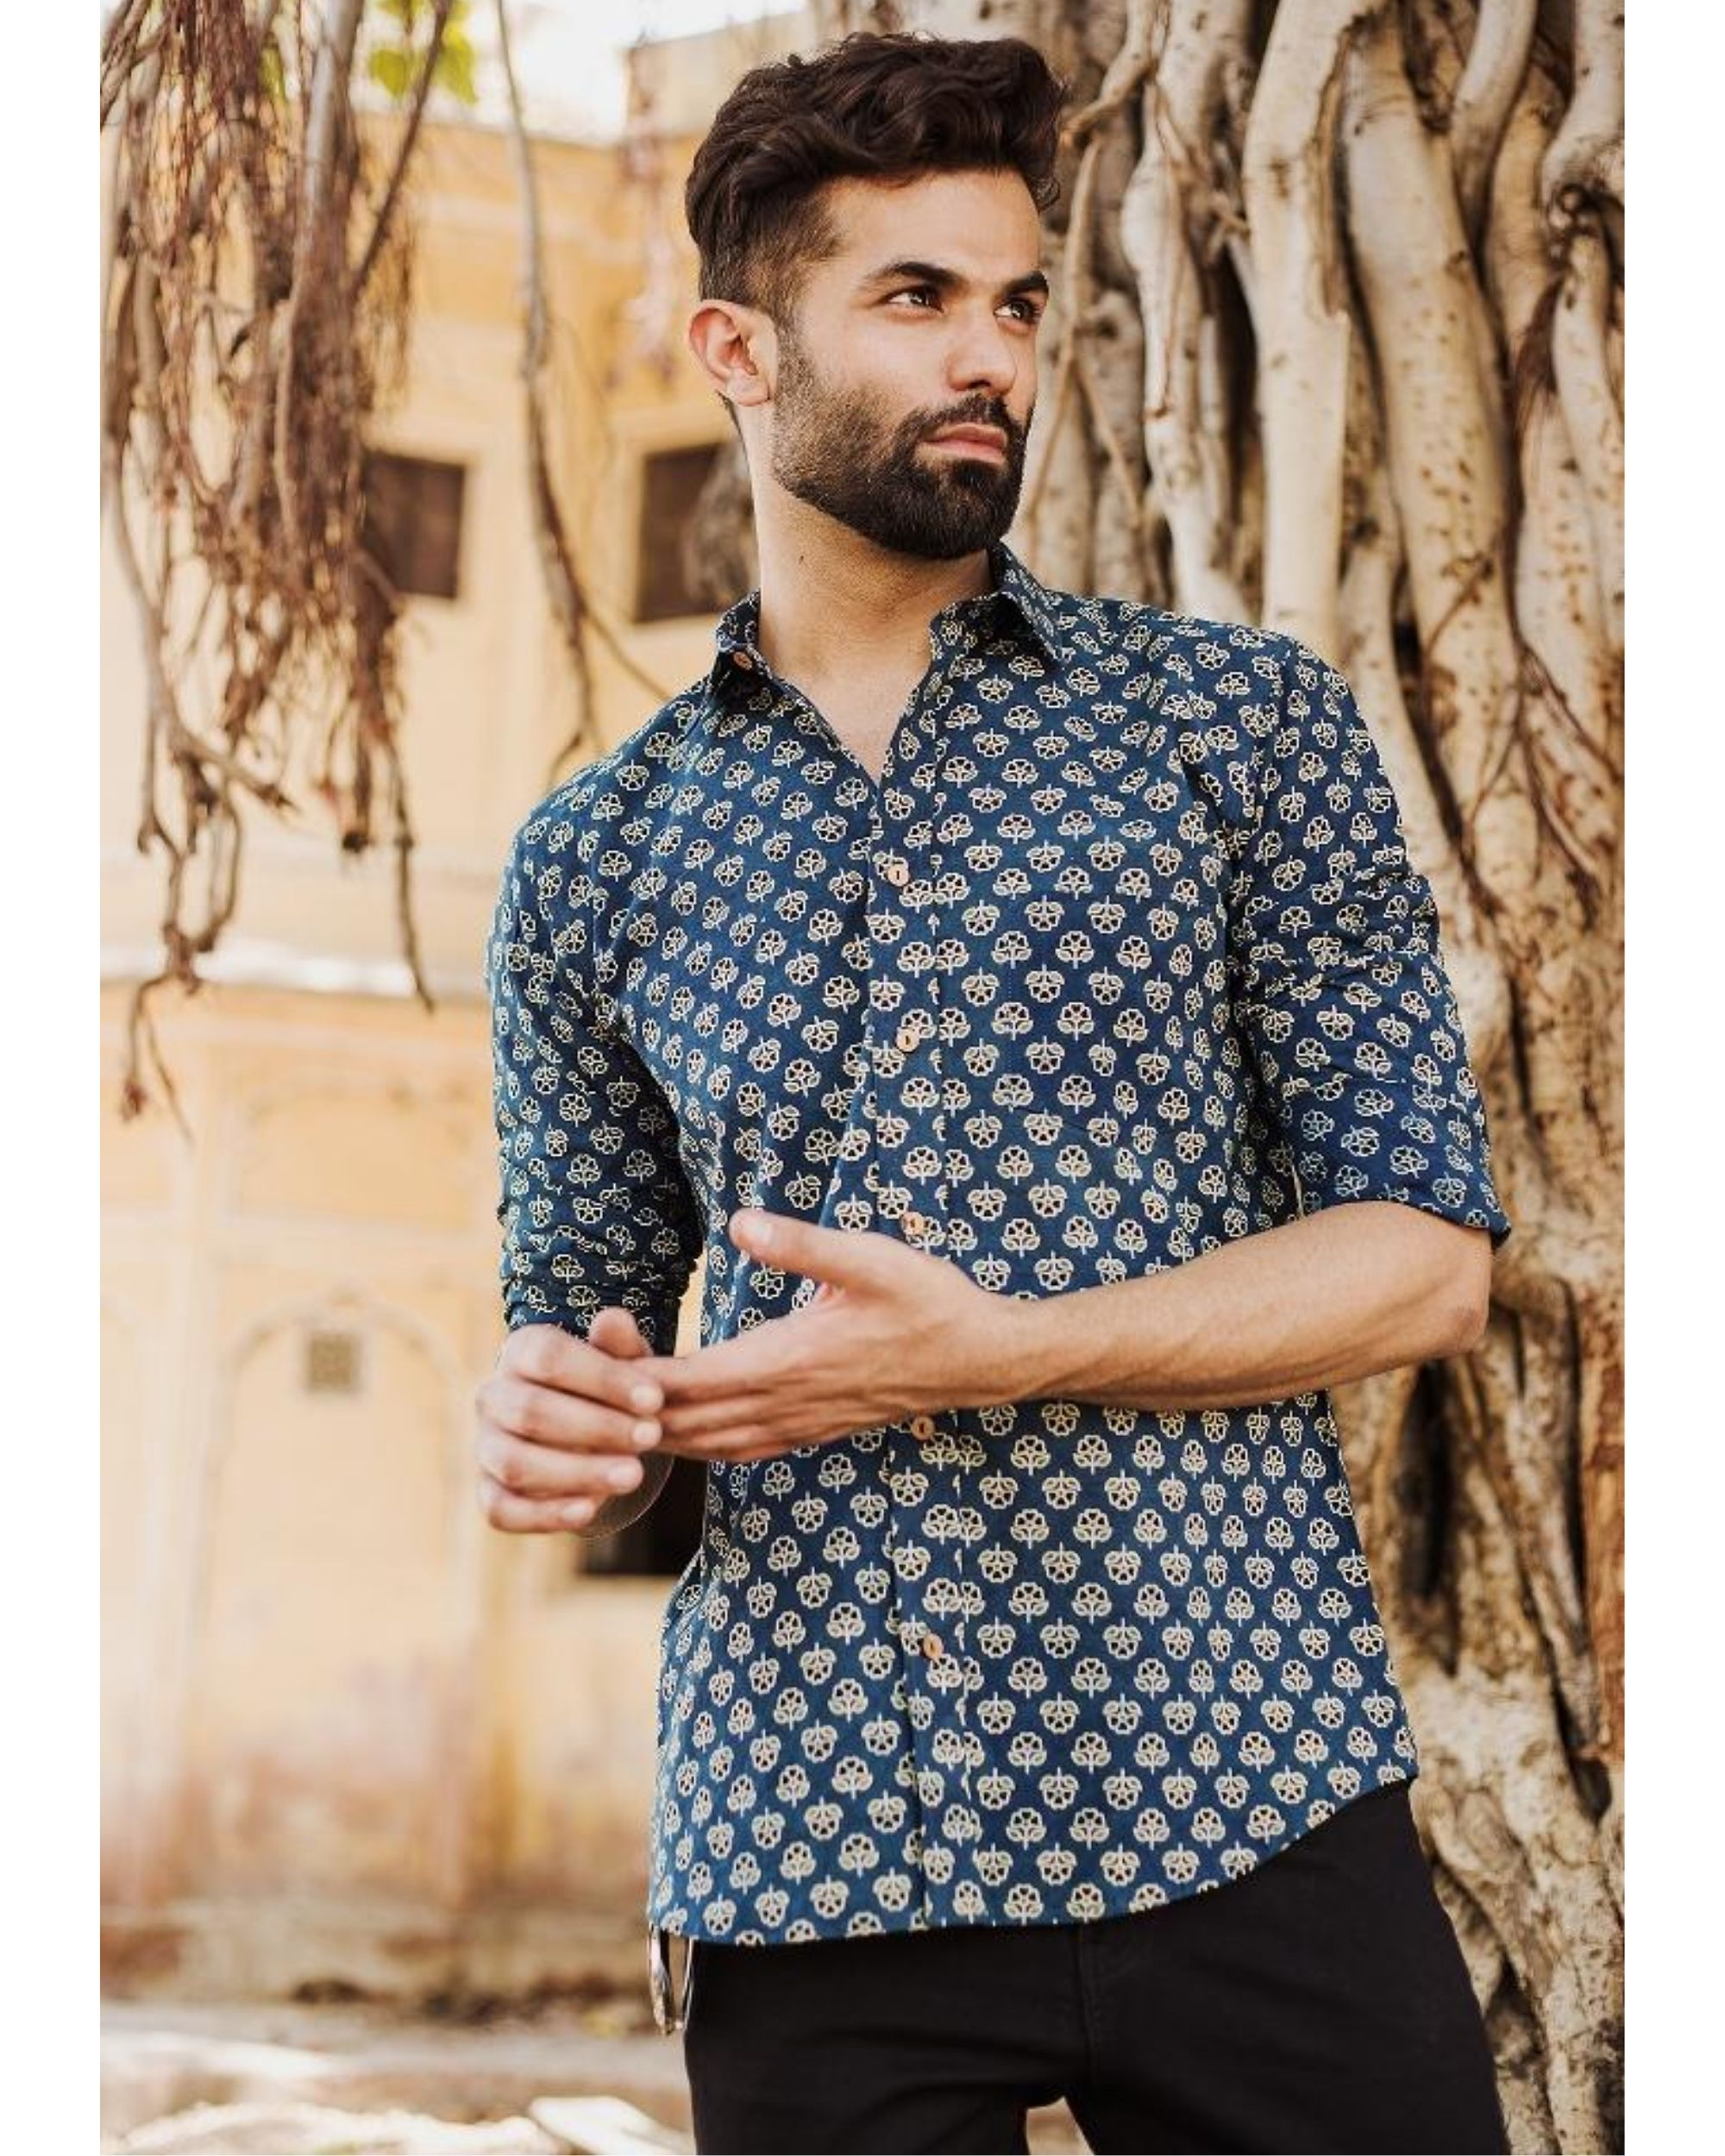 Blue and black ajrakh floral printed shirt